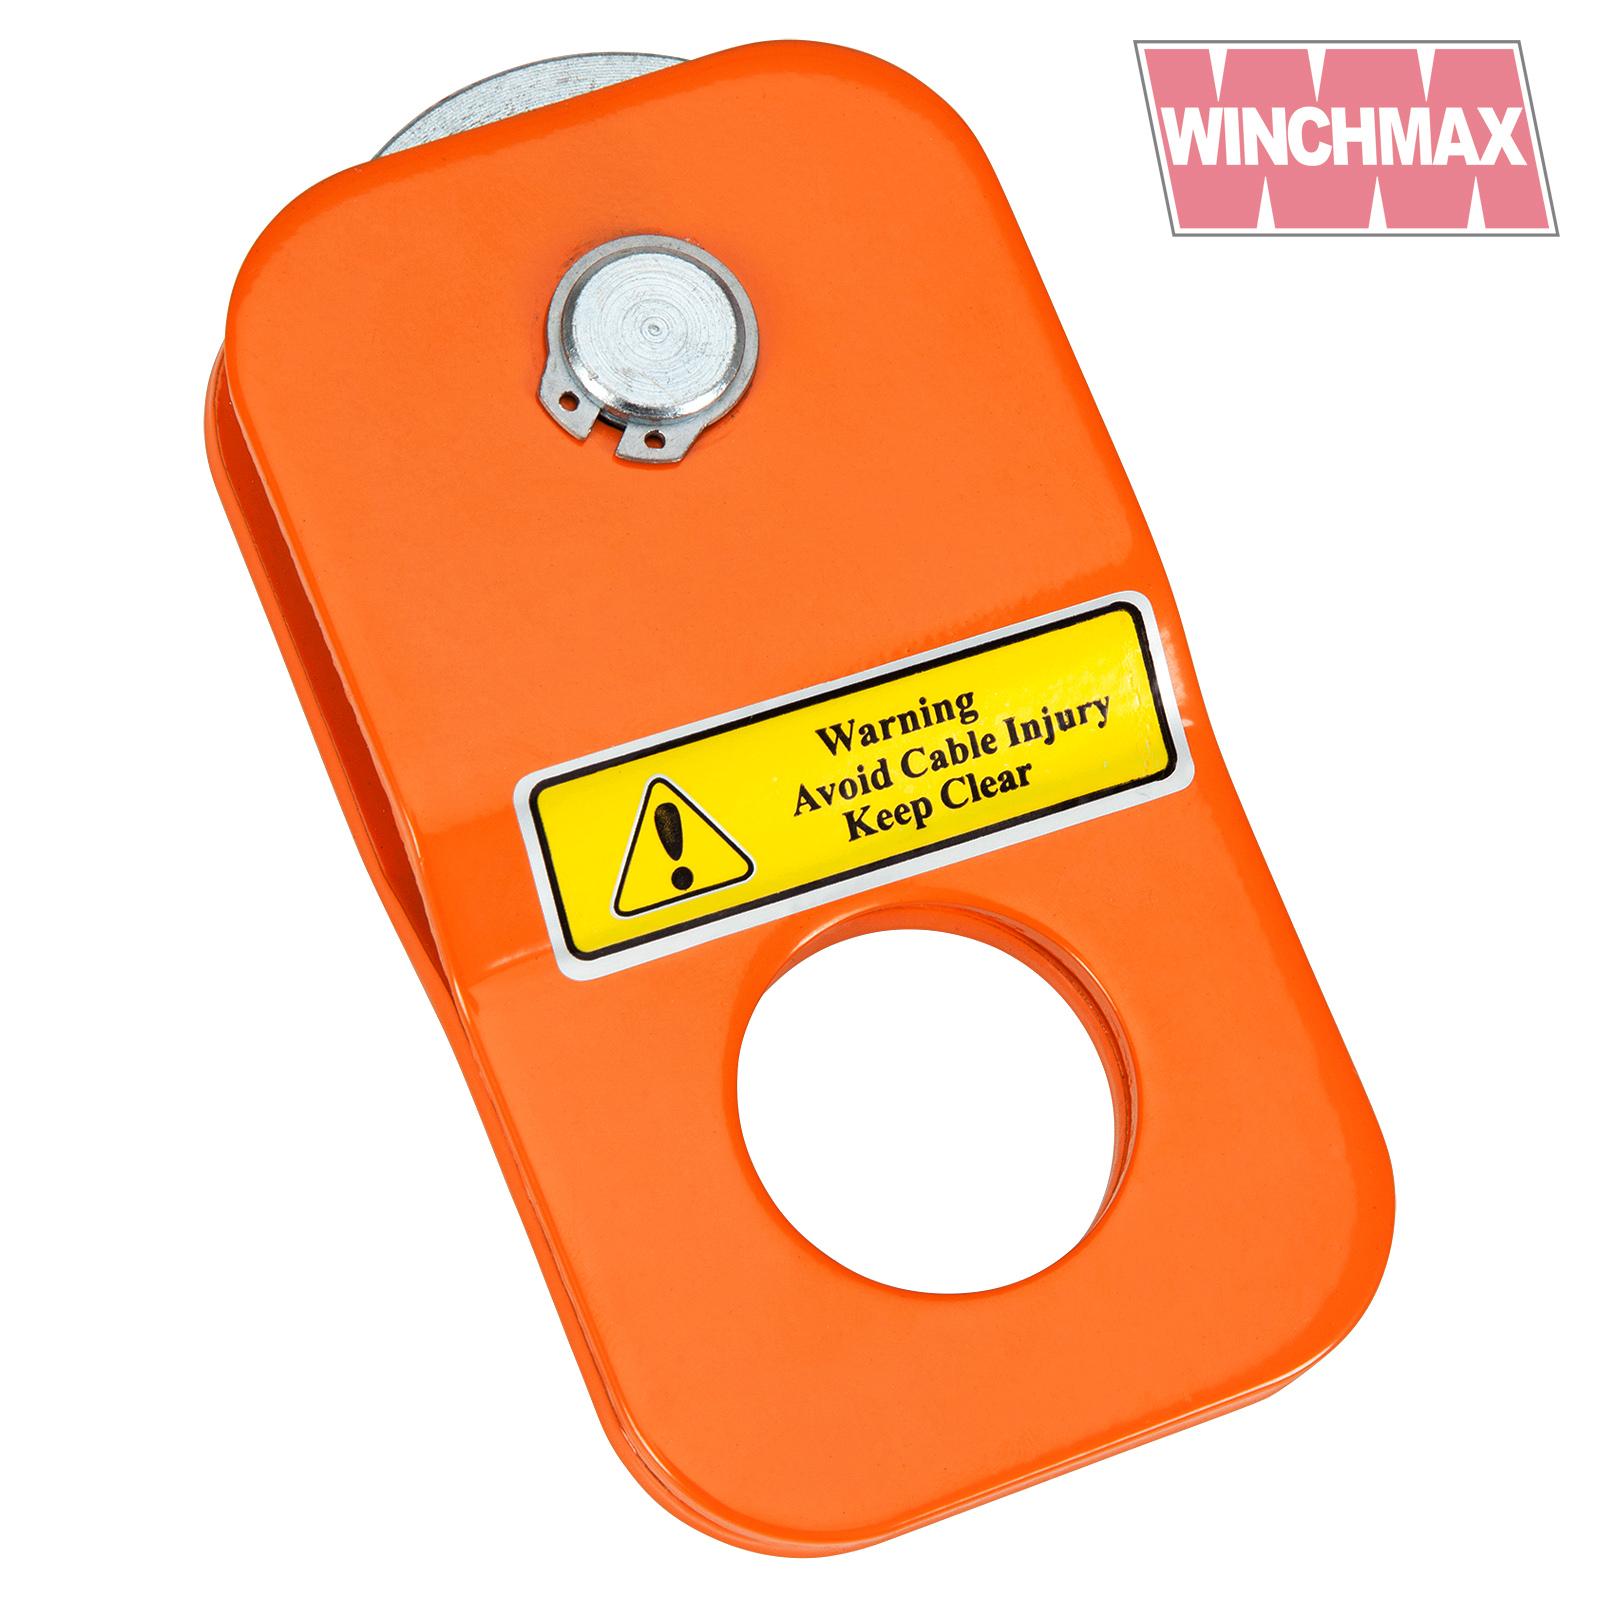 Wmsb4 winchmax 389 copy